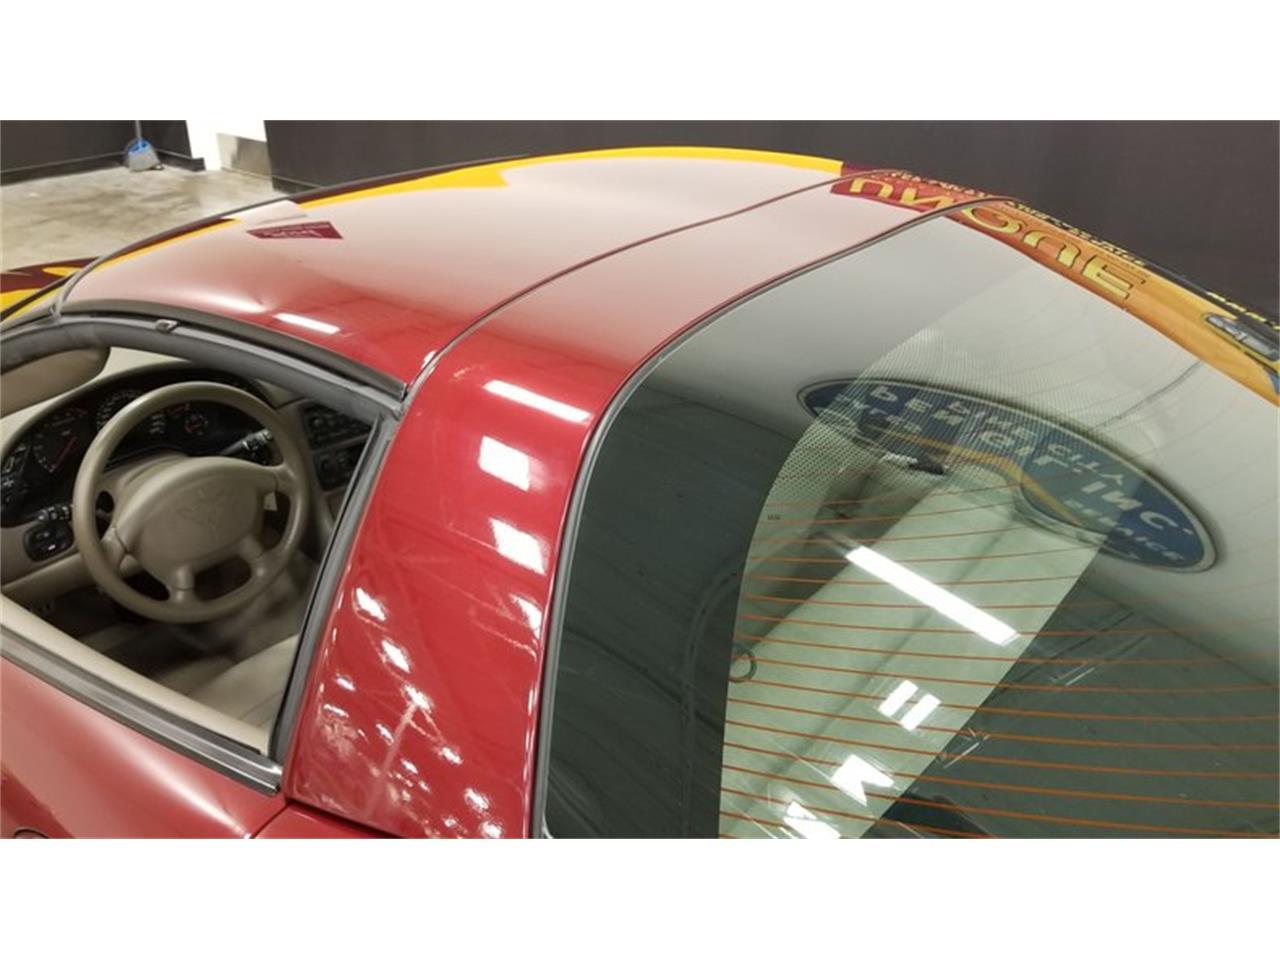 2003 Chevrolet Corvette (CC-1388844) for sale in Mankato, Minnesota